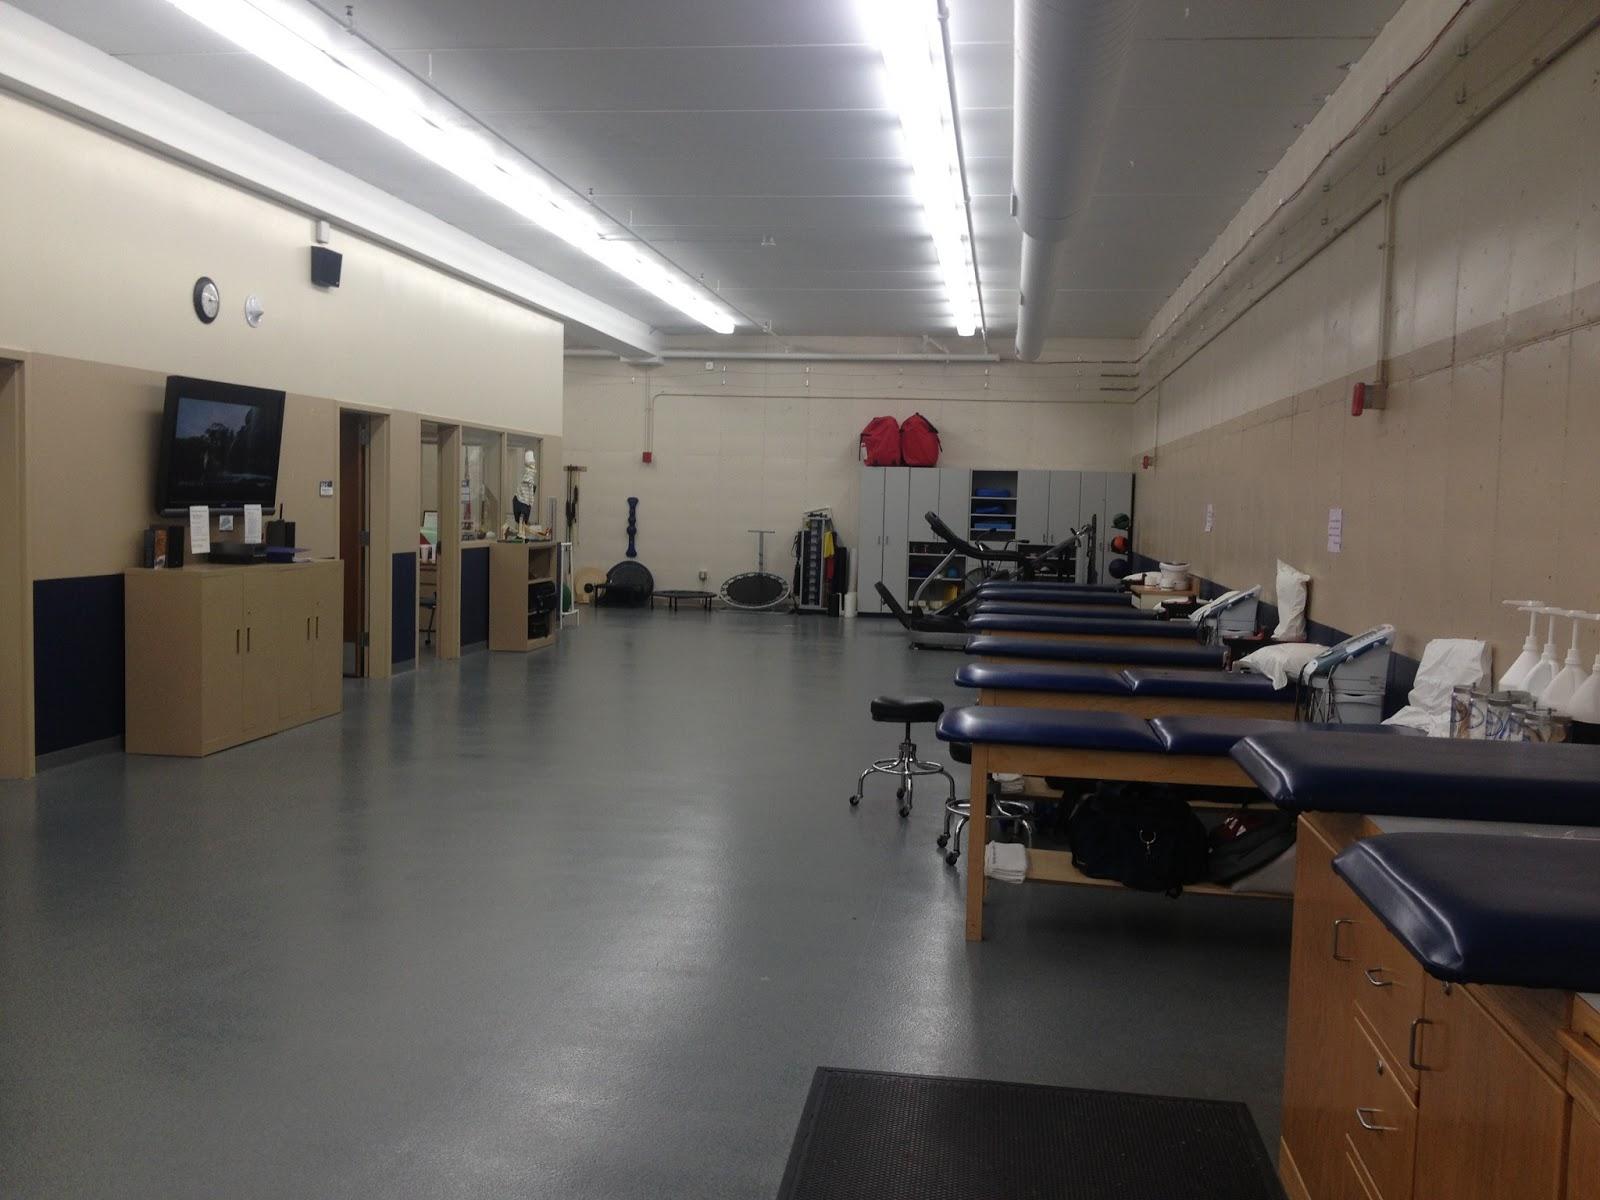 Saint Louis University Athletic Training Program Slu At